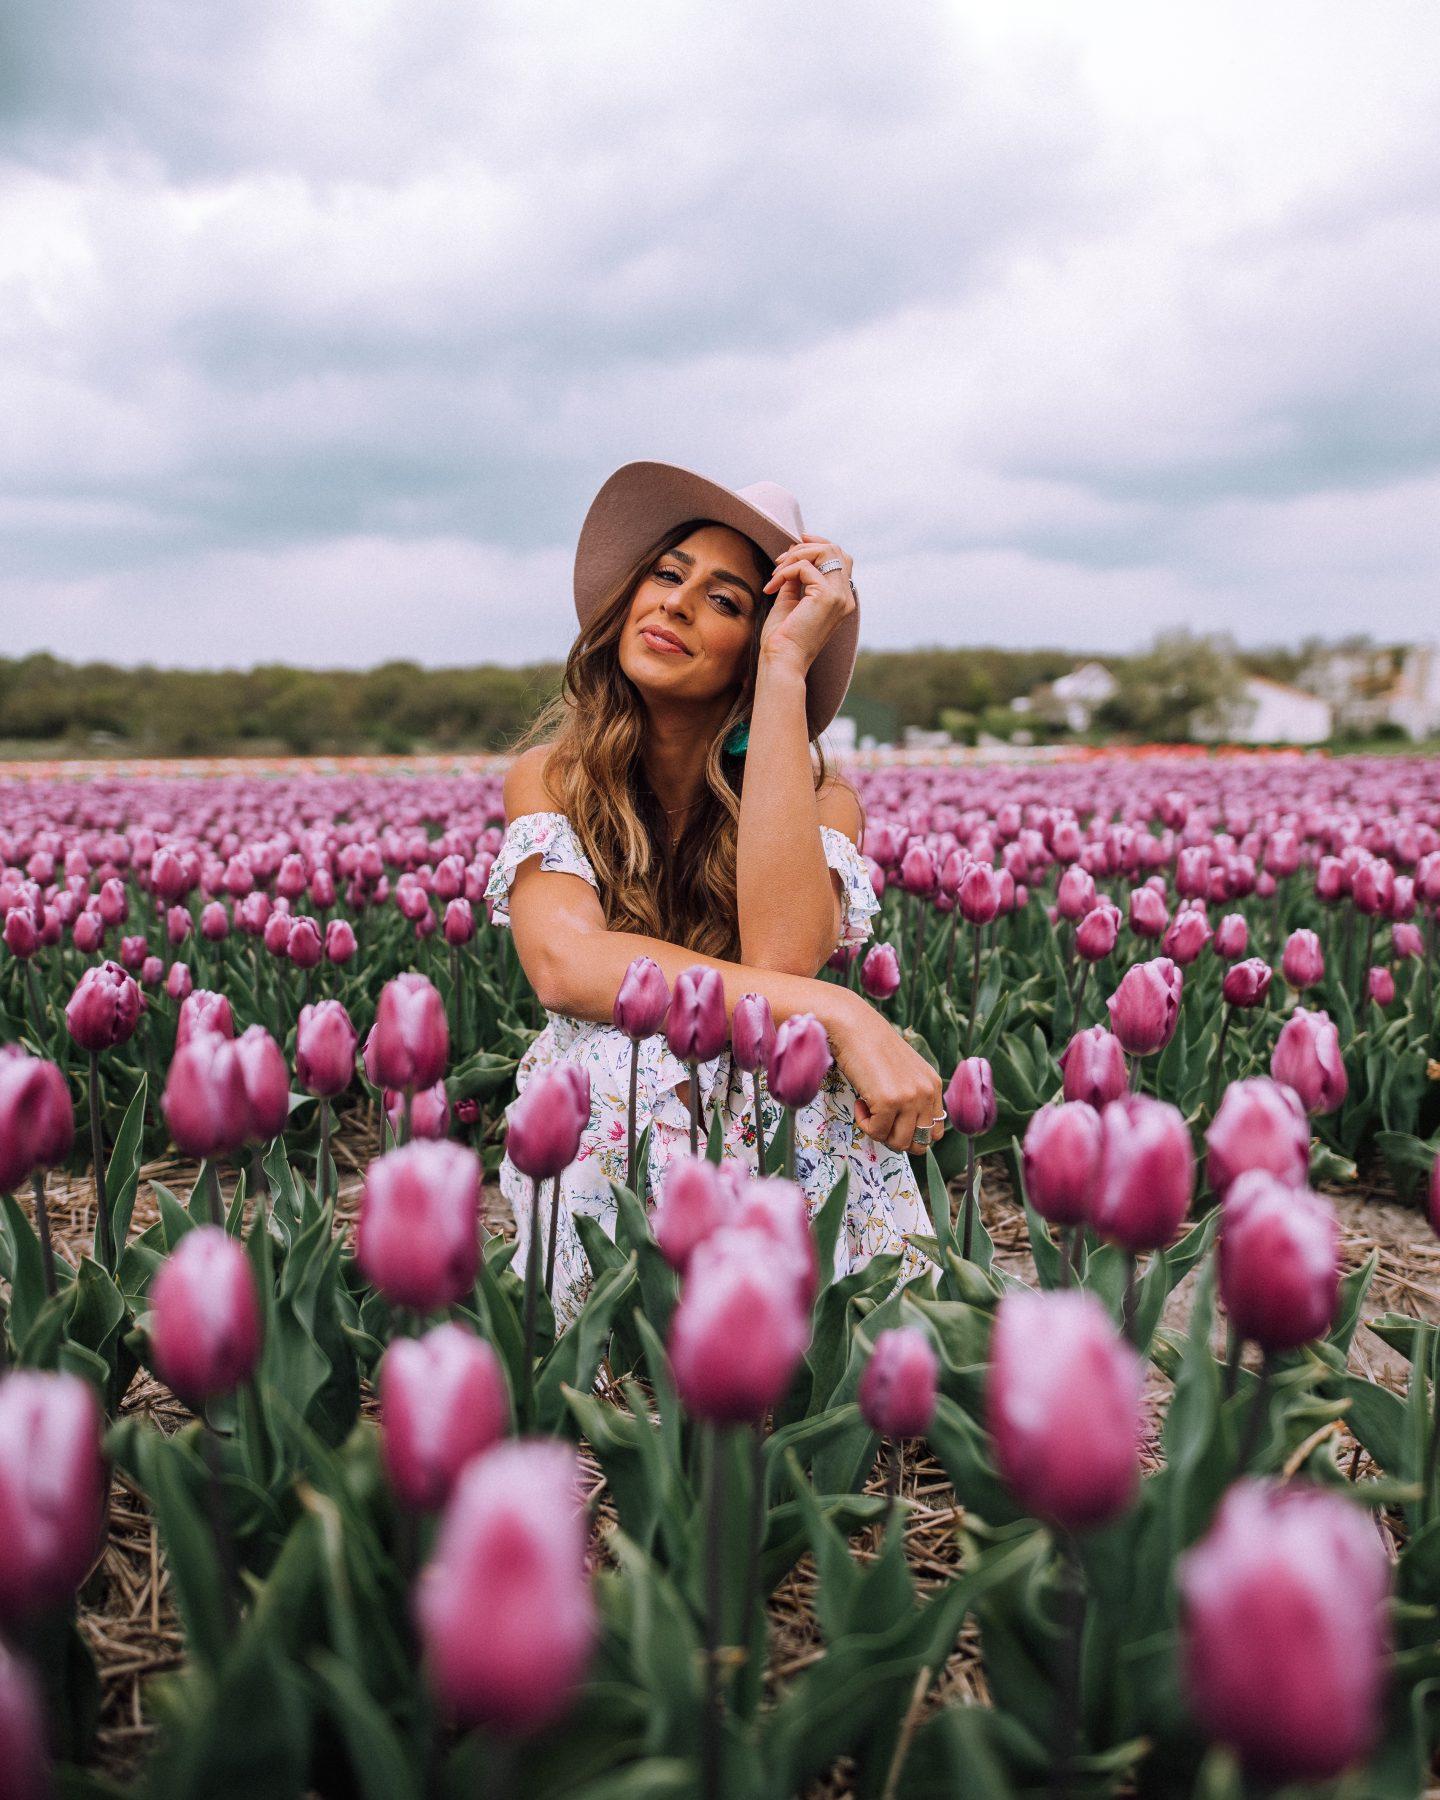 Posing in a Tulip field in the Netherlands